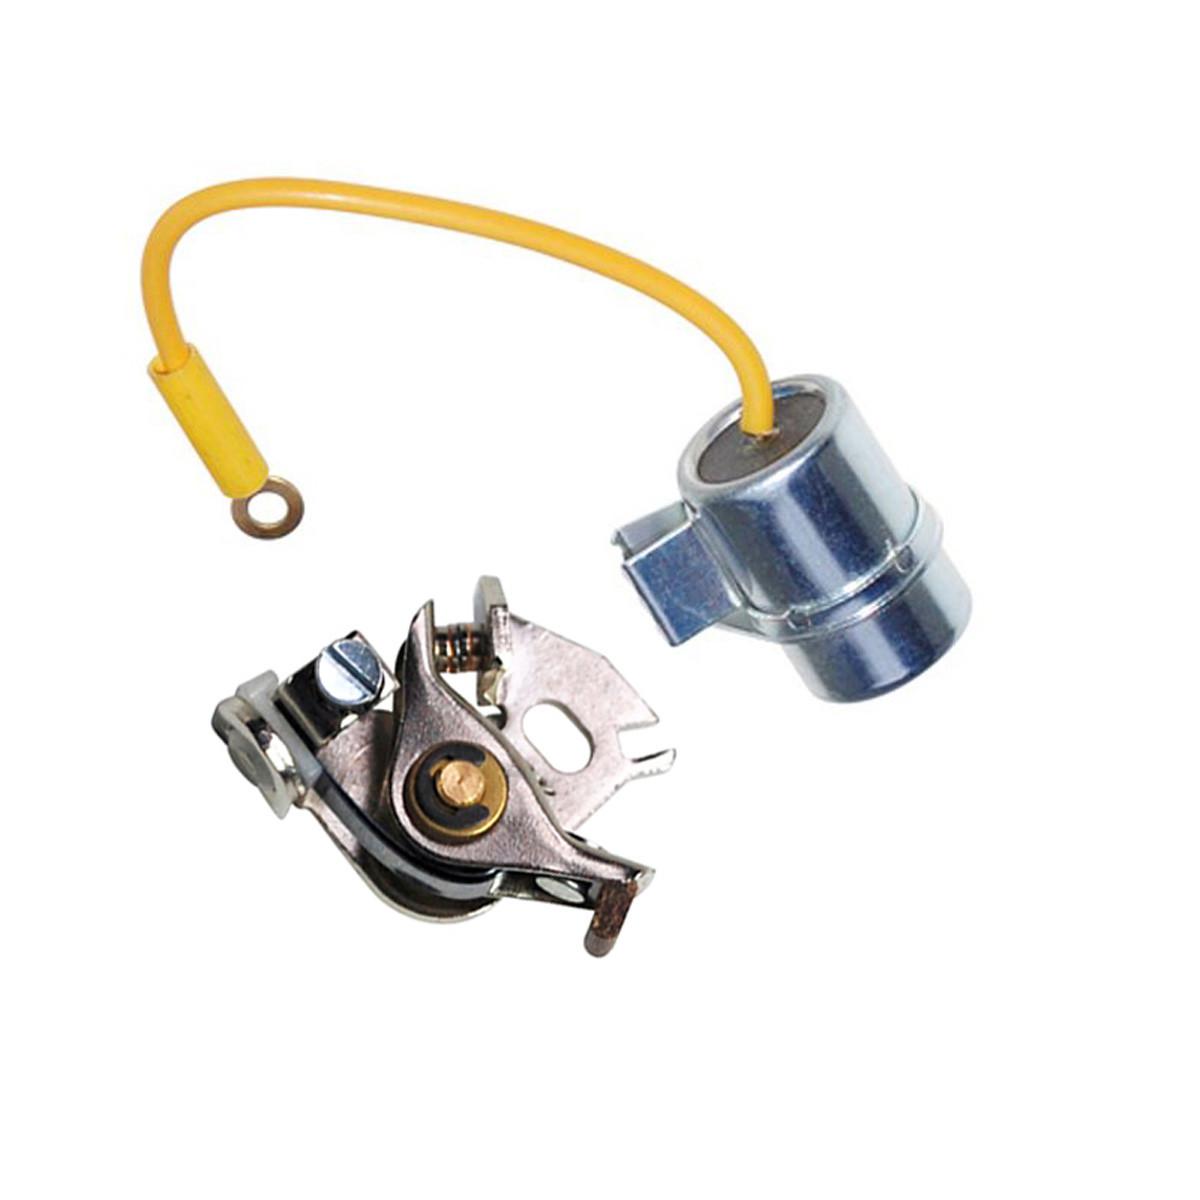 Rupteur + Condensateur Allumage CIAO PX